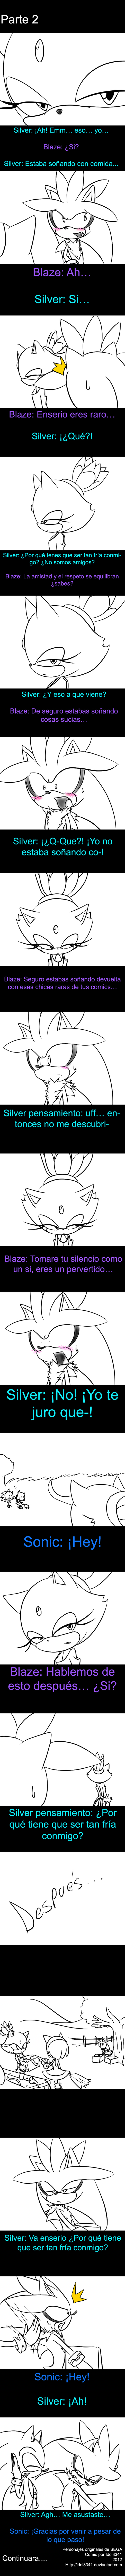 Un comic Silvaze? parte 2 by idolnya